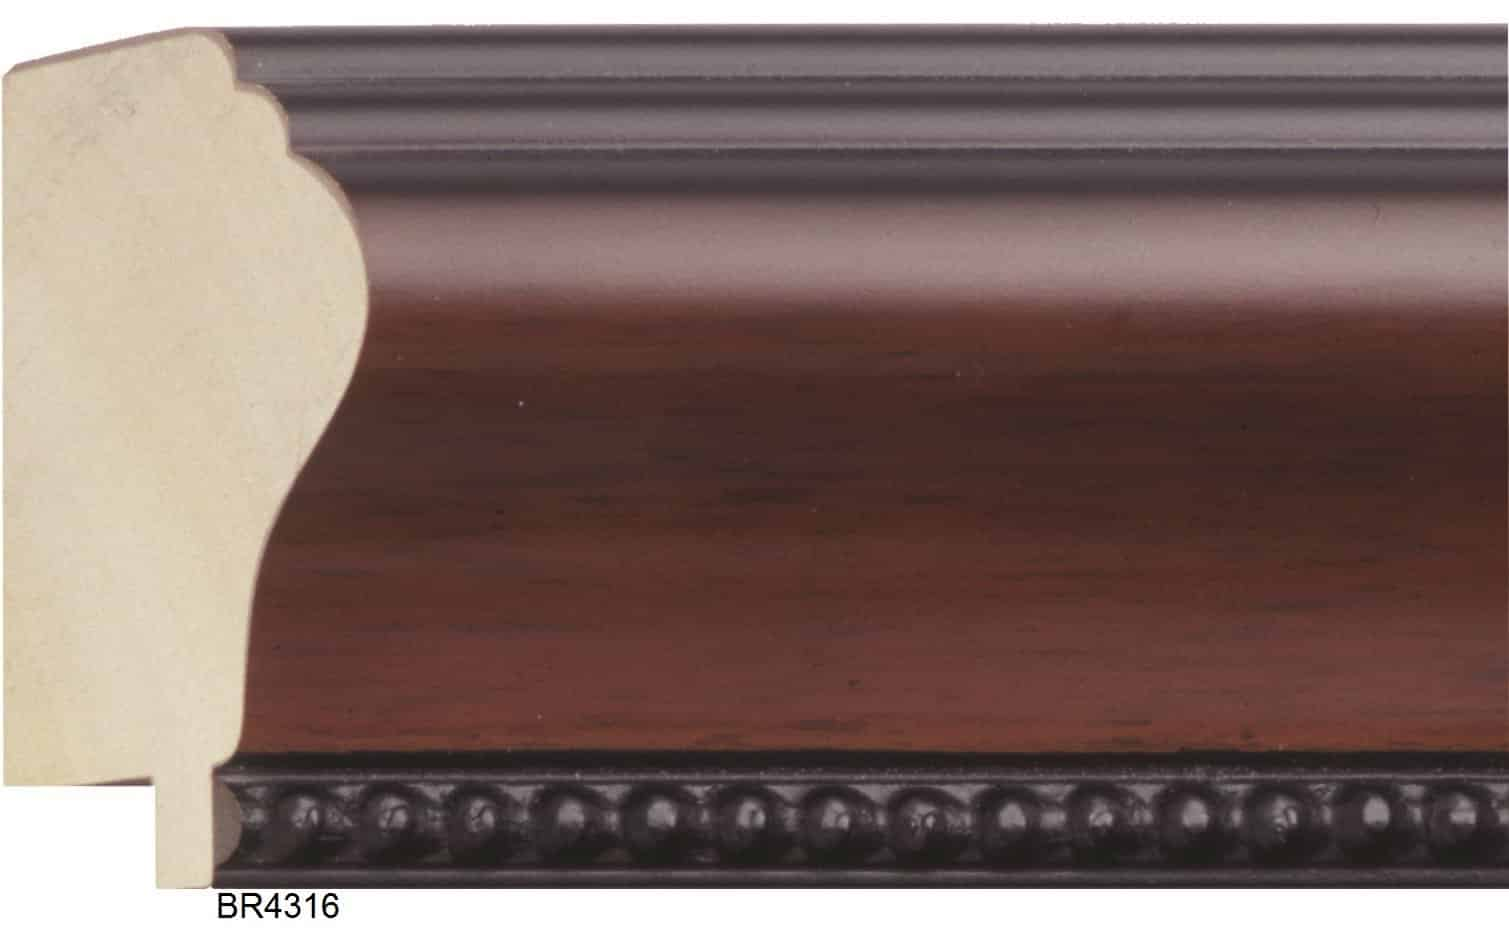 2 1/2 inch WALNUT COLOR FINISH W/BEAD